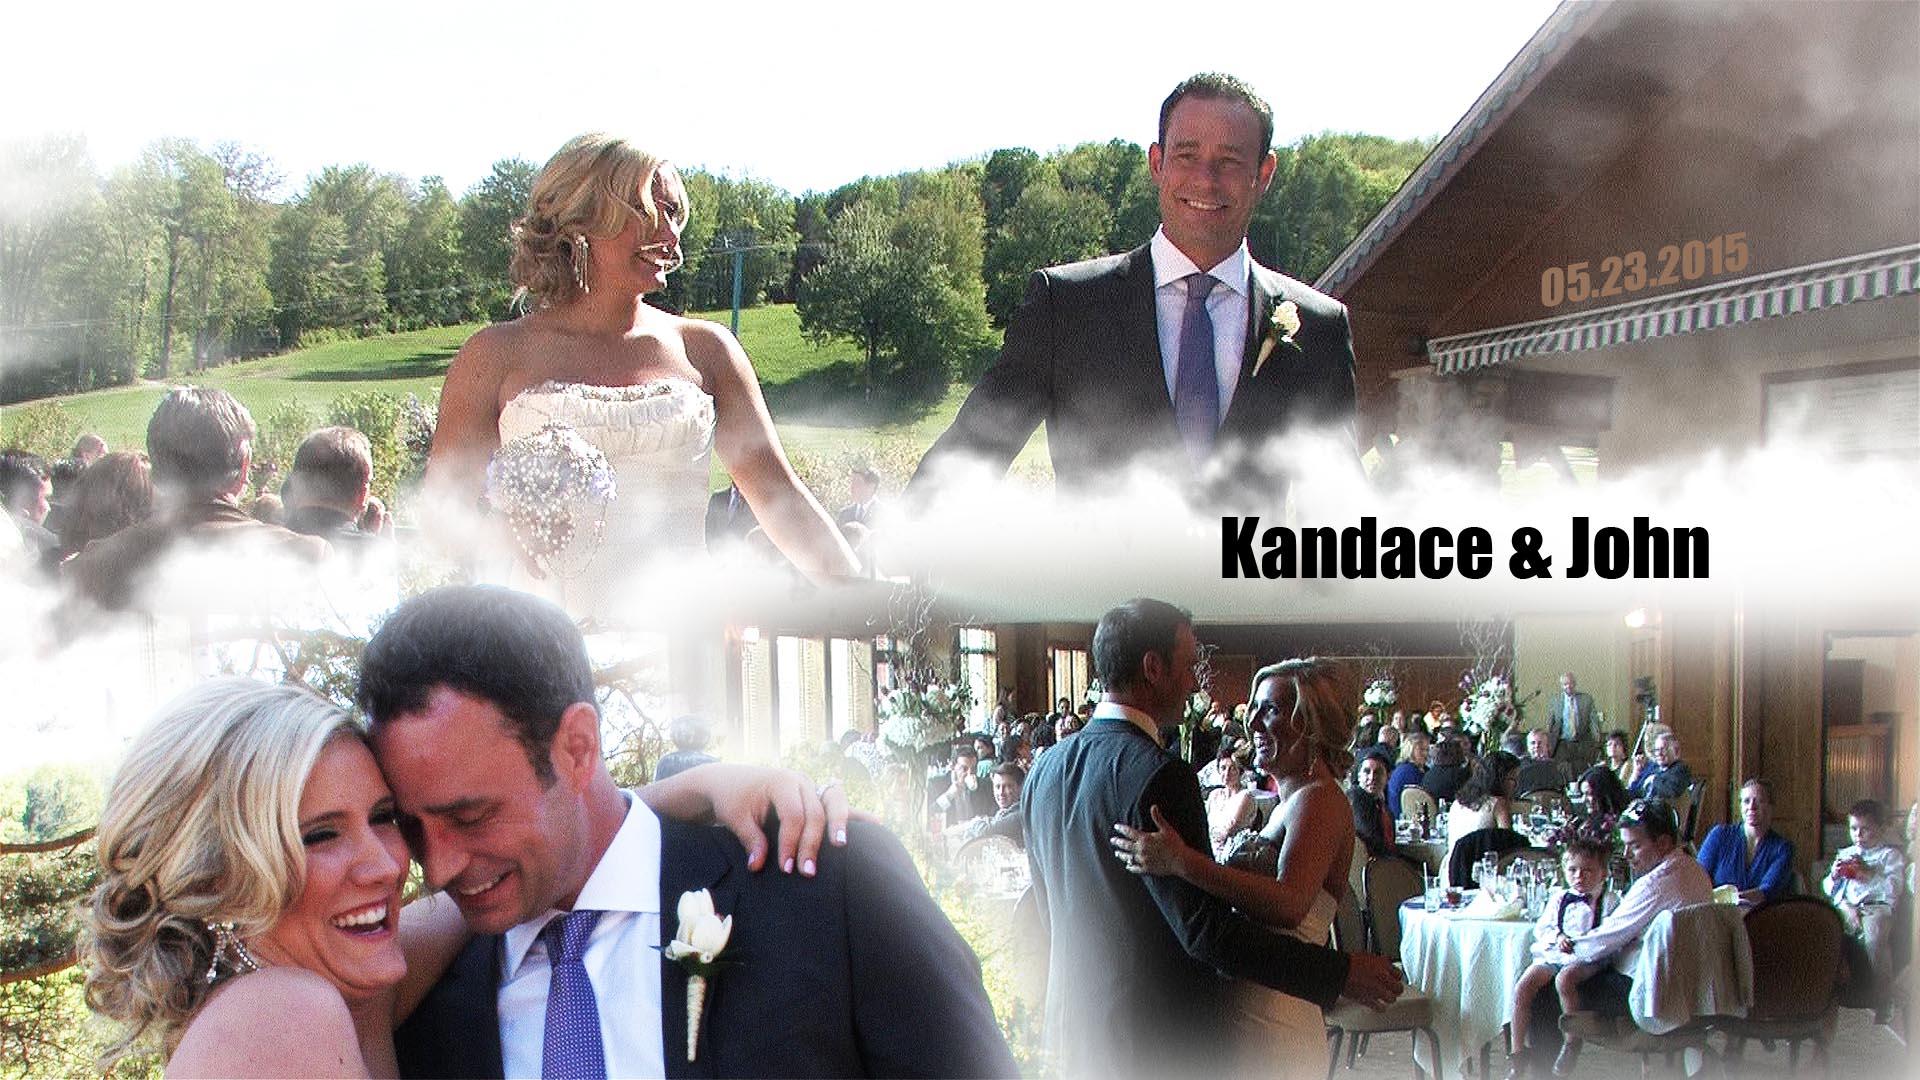 John & Kandace – Holiday Valley Ellicottville Wedding Video